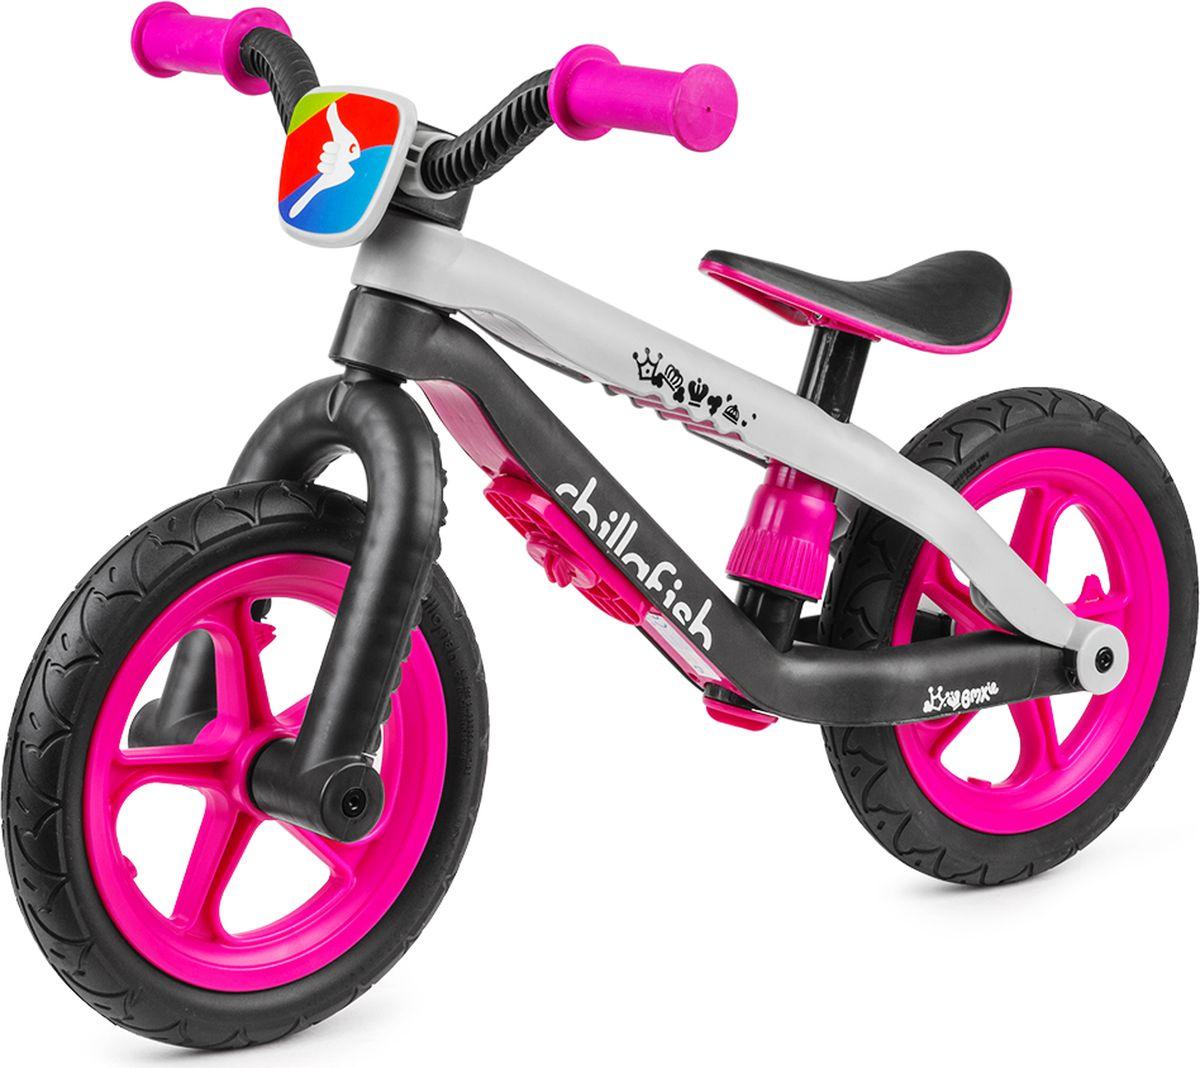 Chillafish Беговел детский BMXie-RS цвет розовый -  Беговелы